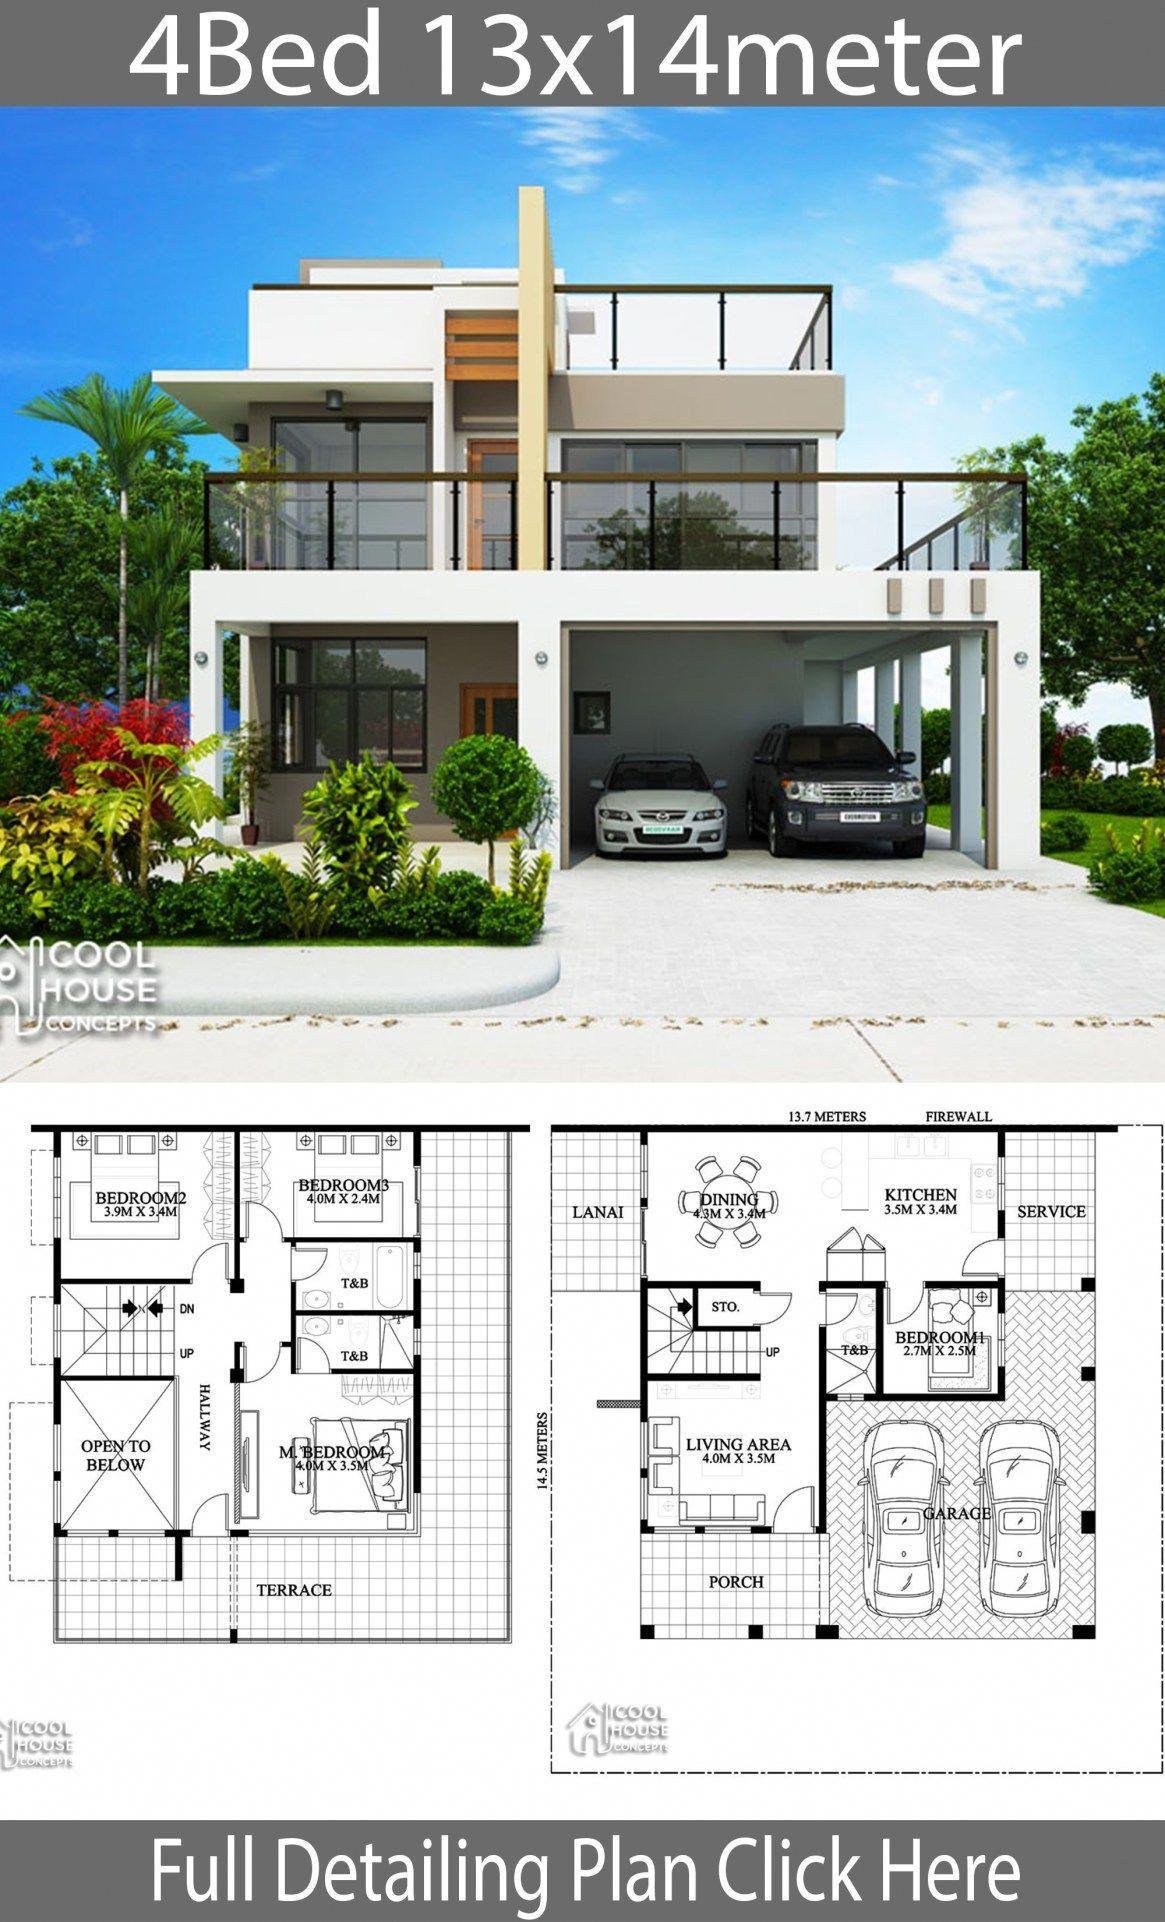 Home Design Plan 13x14m With 4 Bedrooms Home Design With Plansearch Tophomeinteriors Arsitektur Rumah Pedesaan Arsitektur Rumah